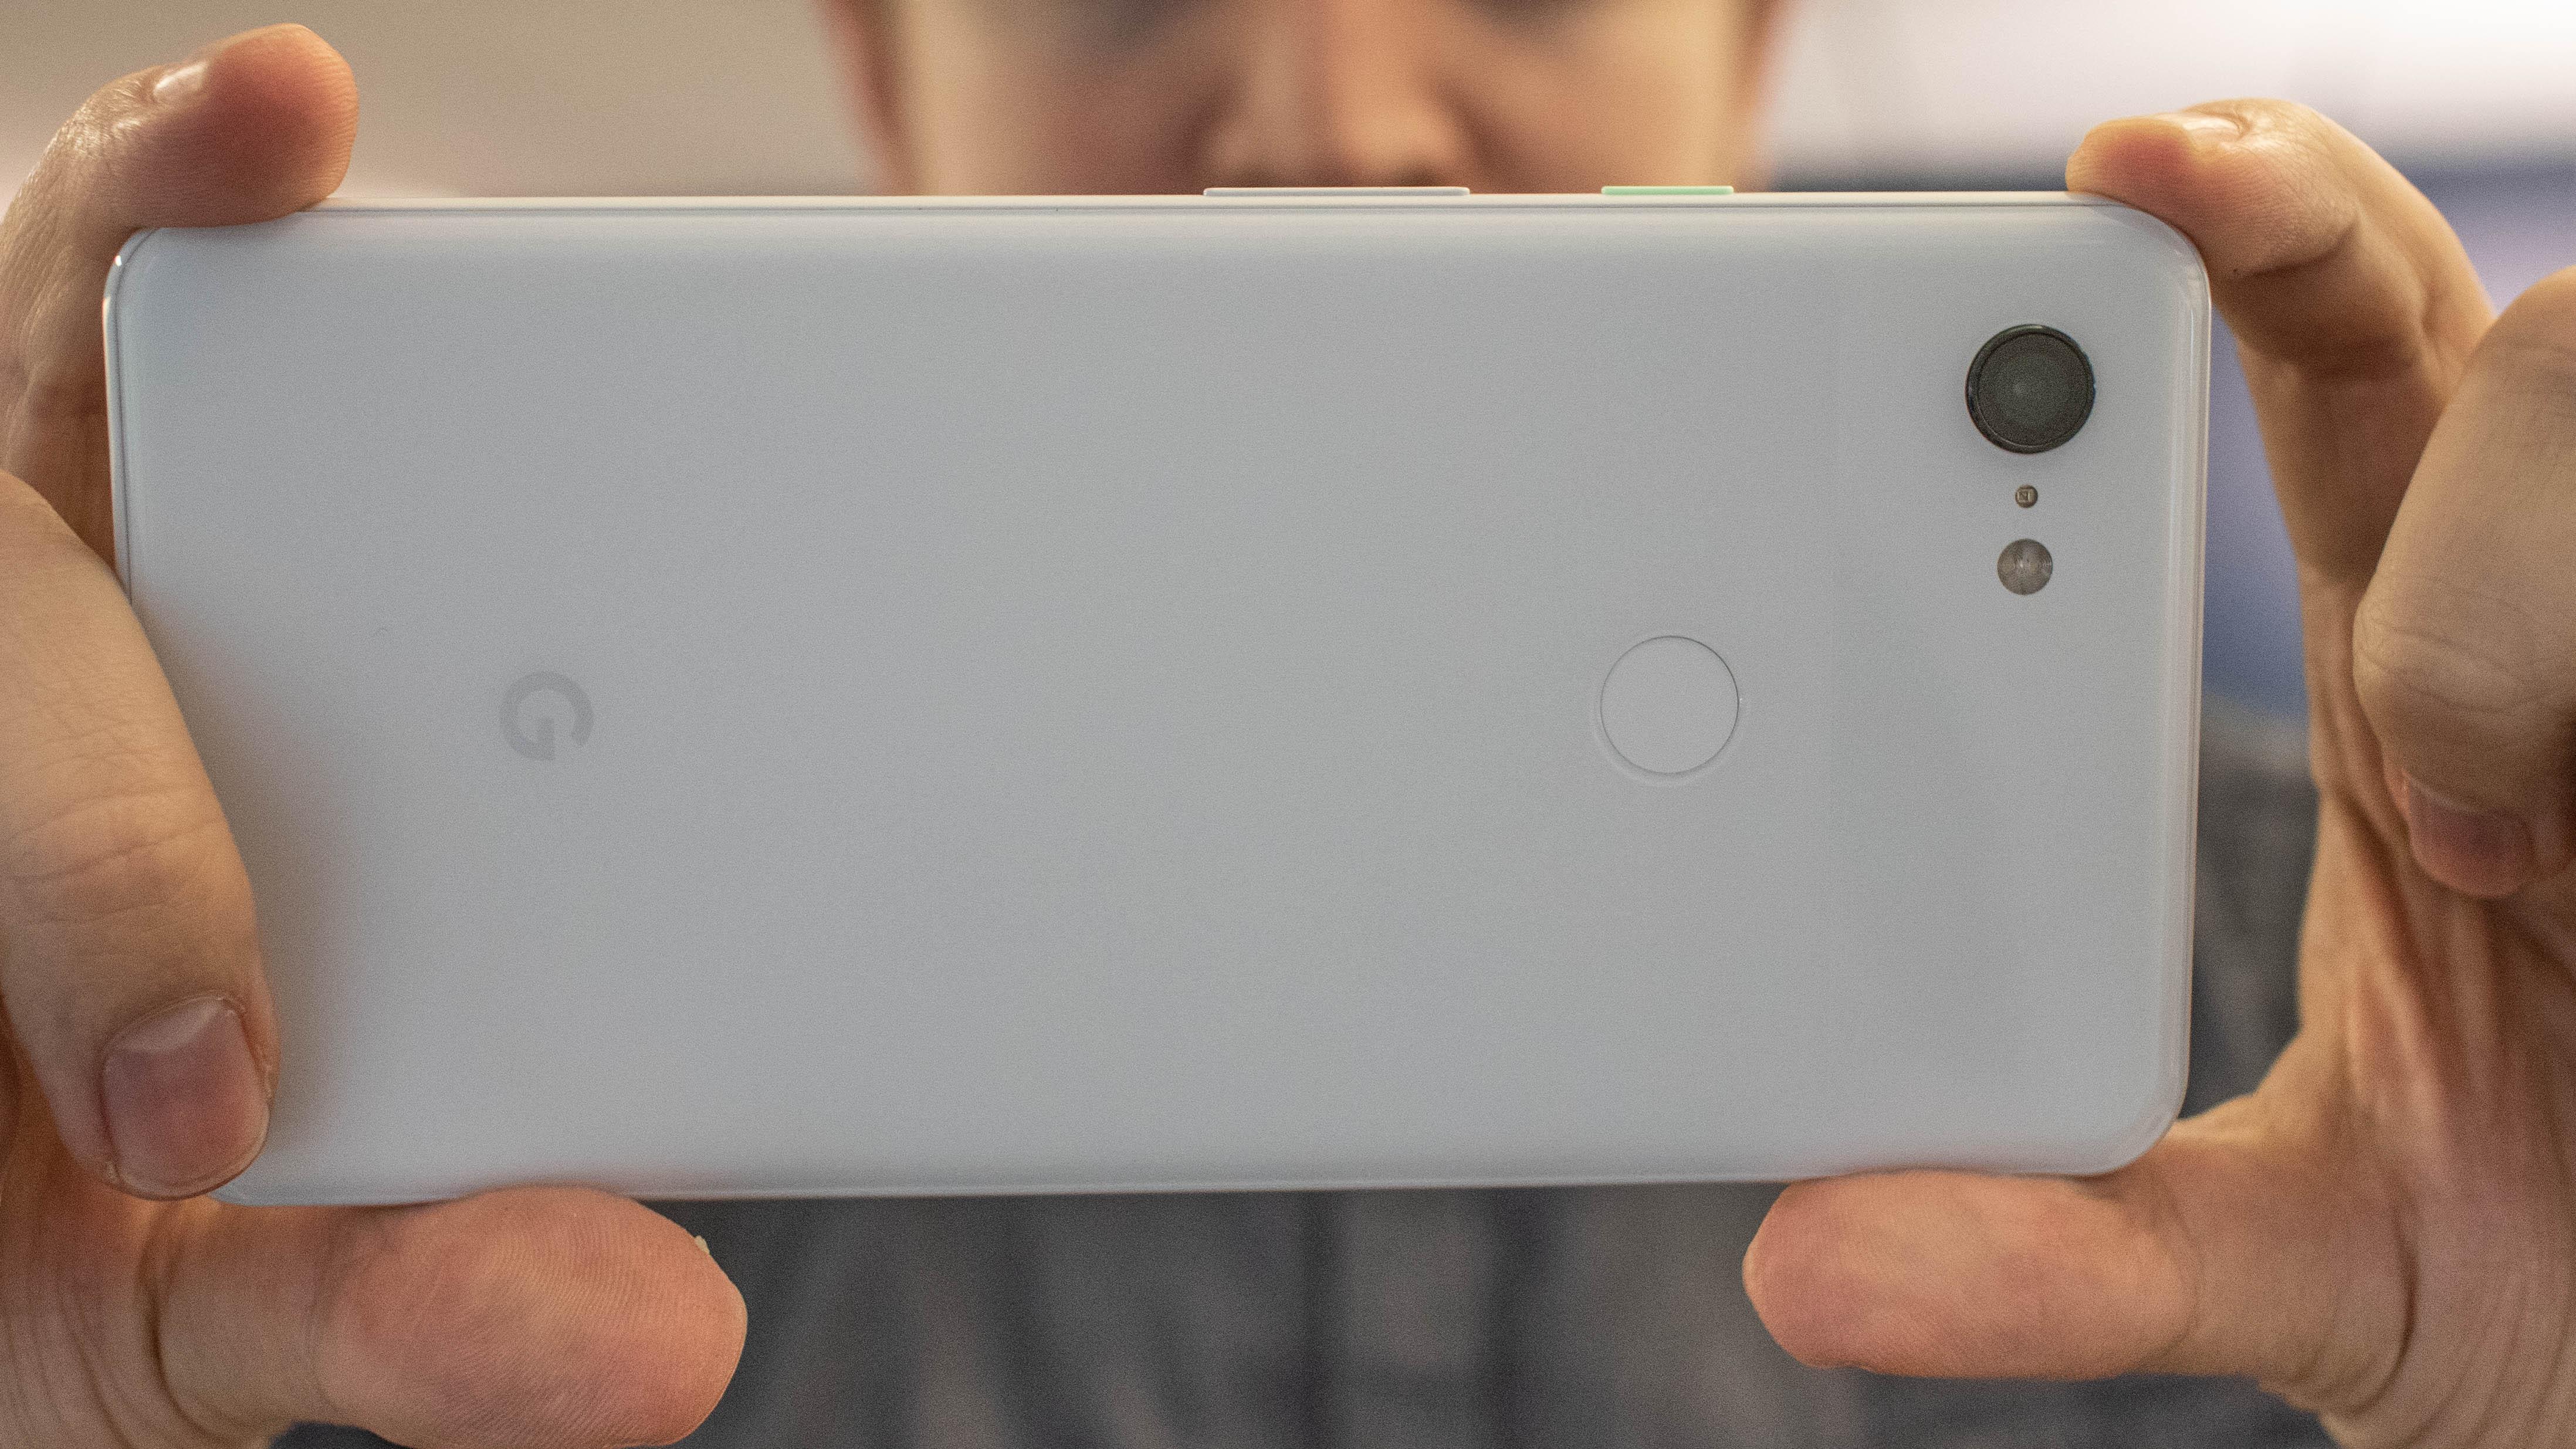 future blurred: unmasking smartphone snaps Eb4HzPN9Q2umt8ACjSfg